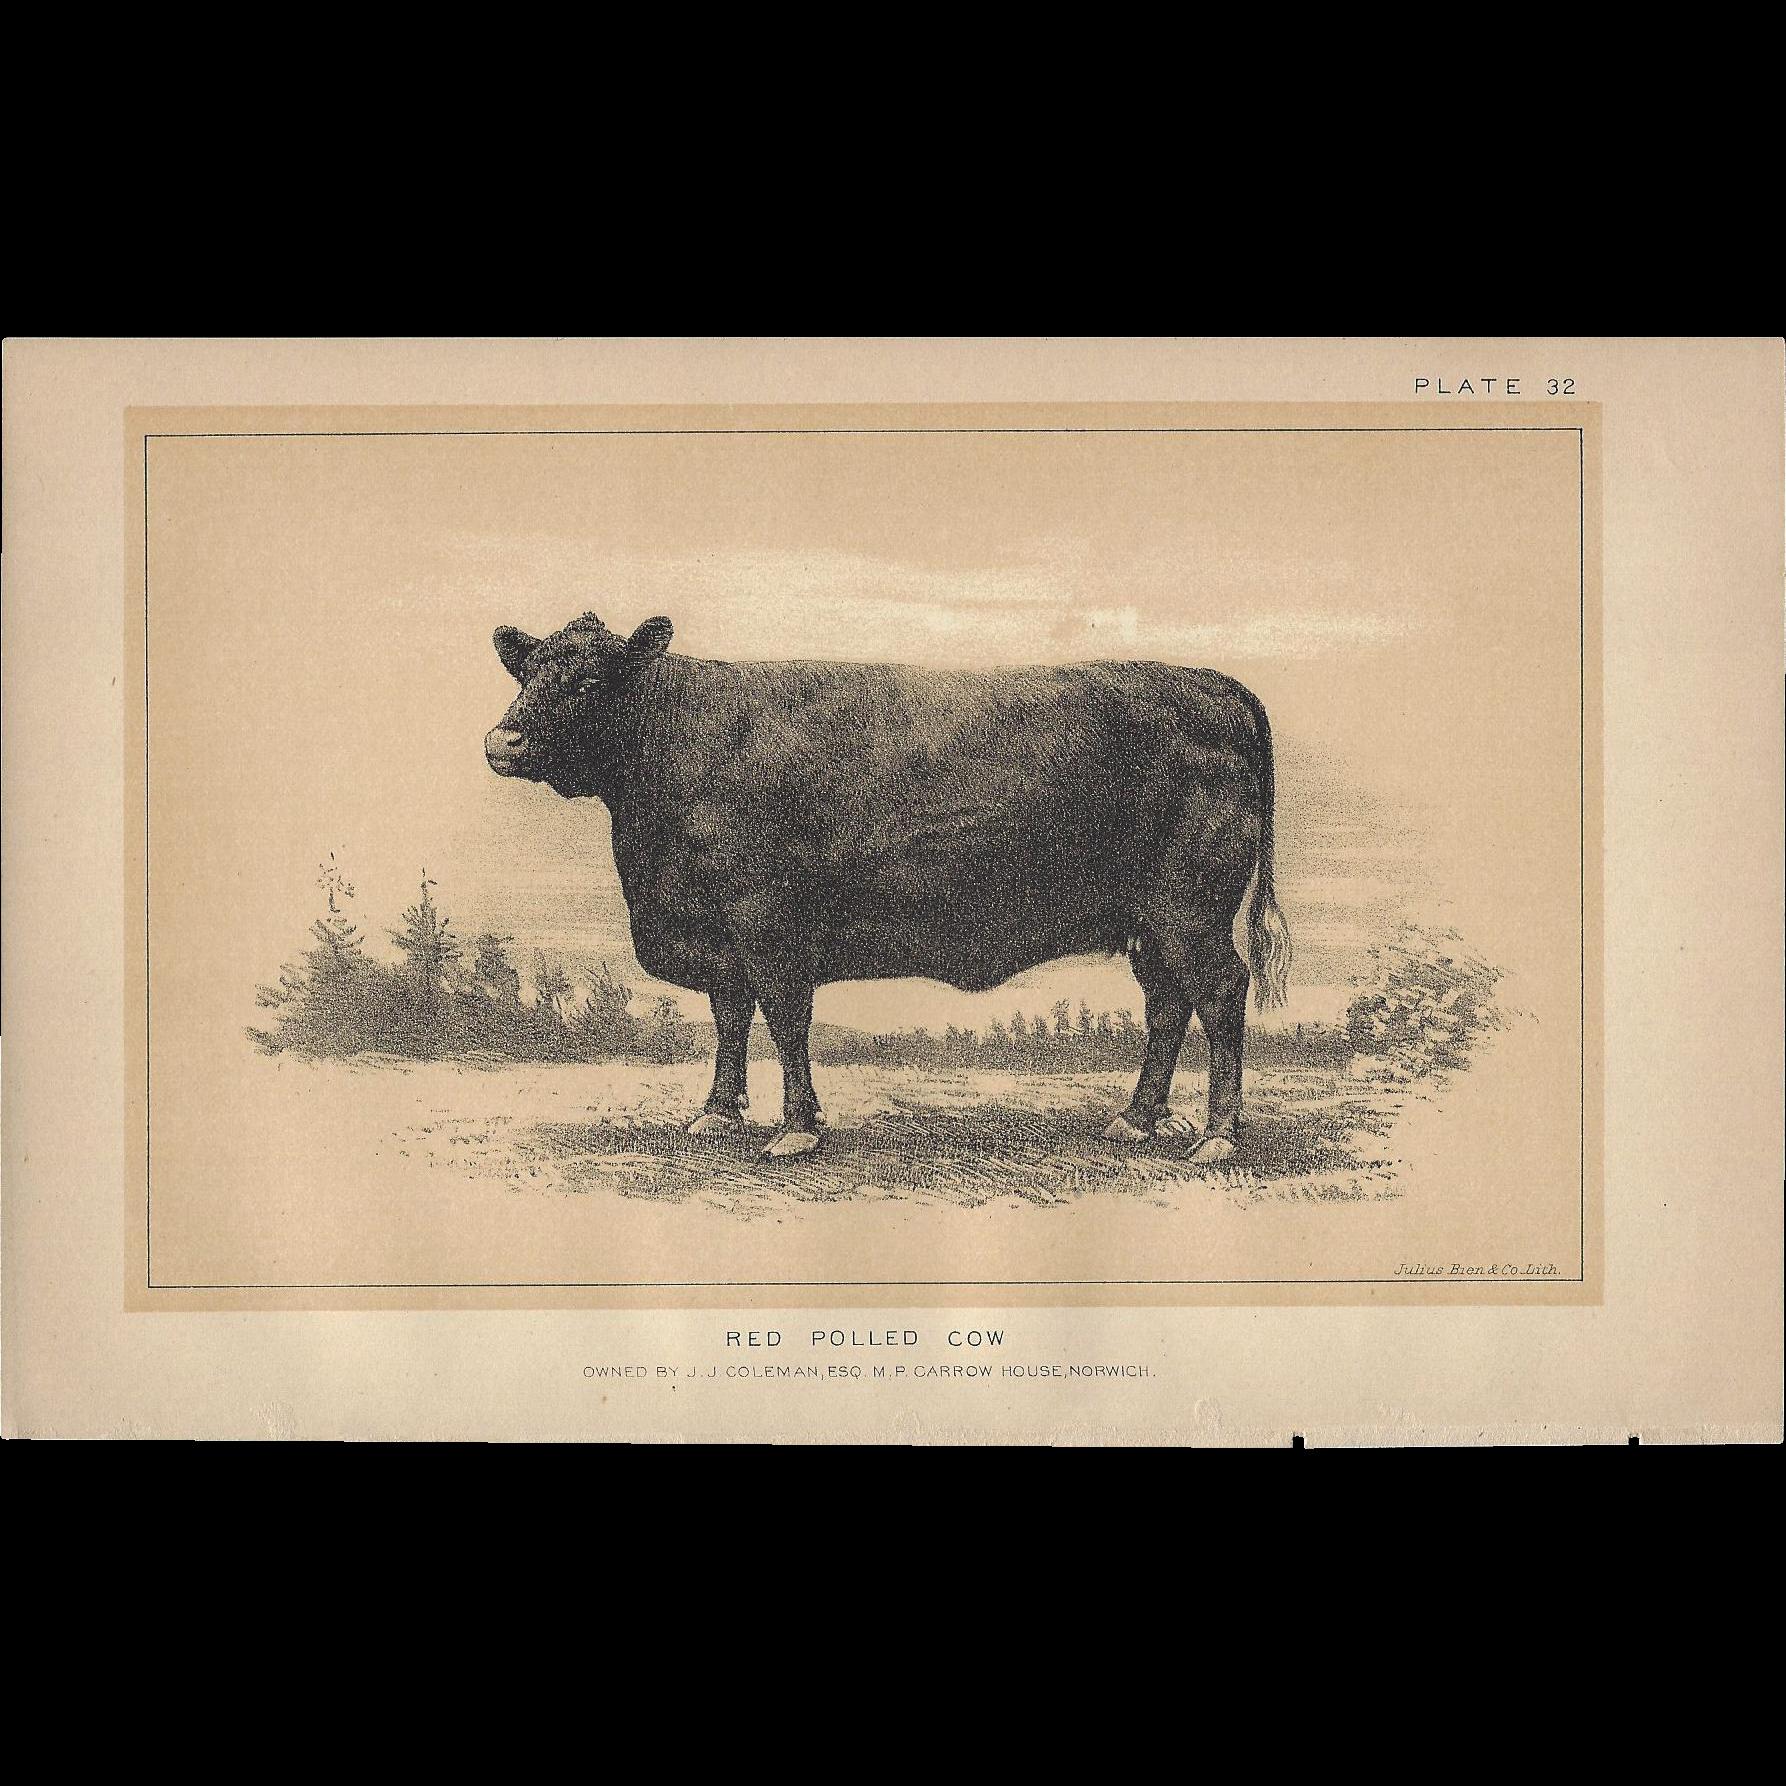 Bi-Color Lithograph RED POLLED COW c. 1888 Julius Bien